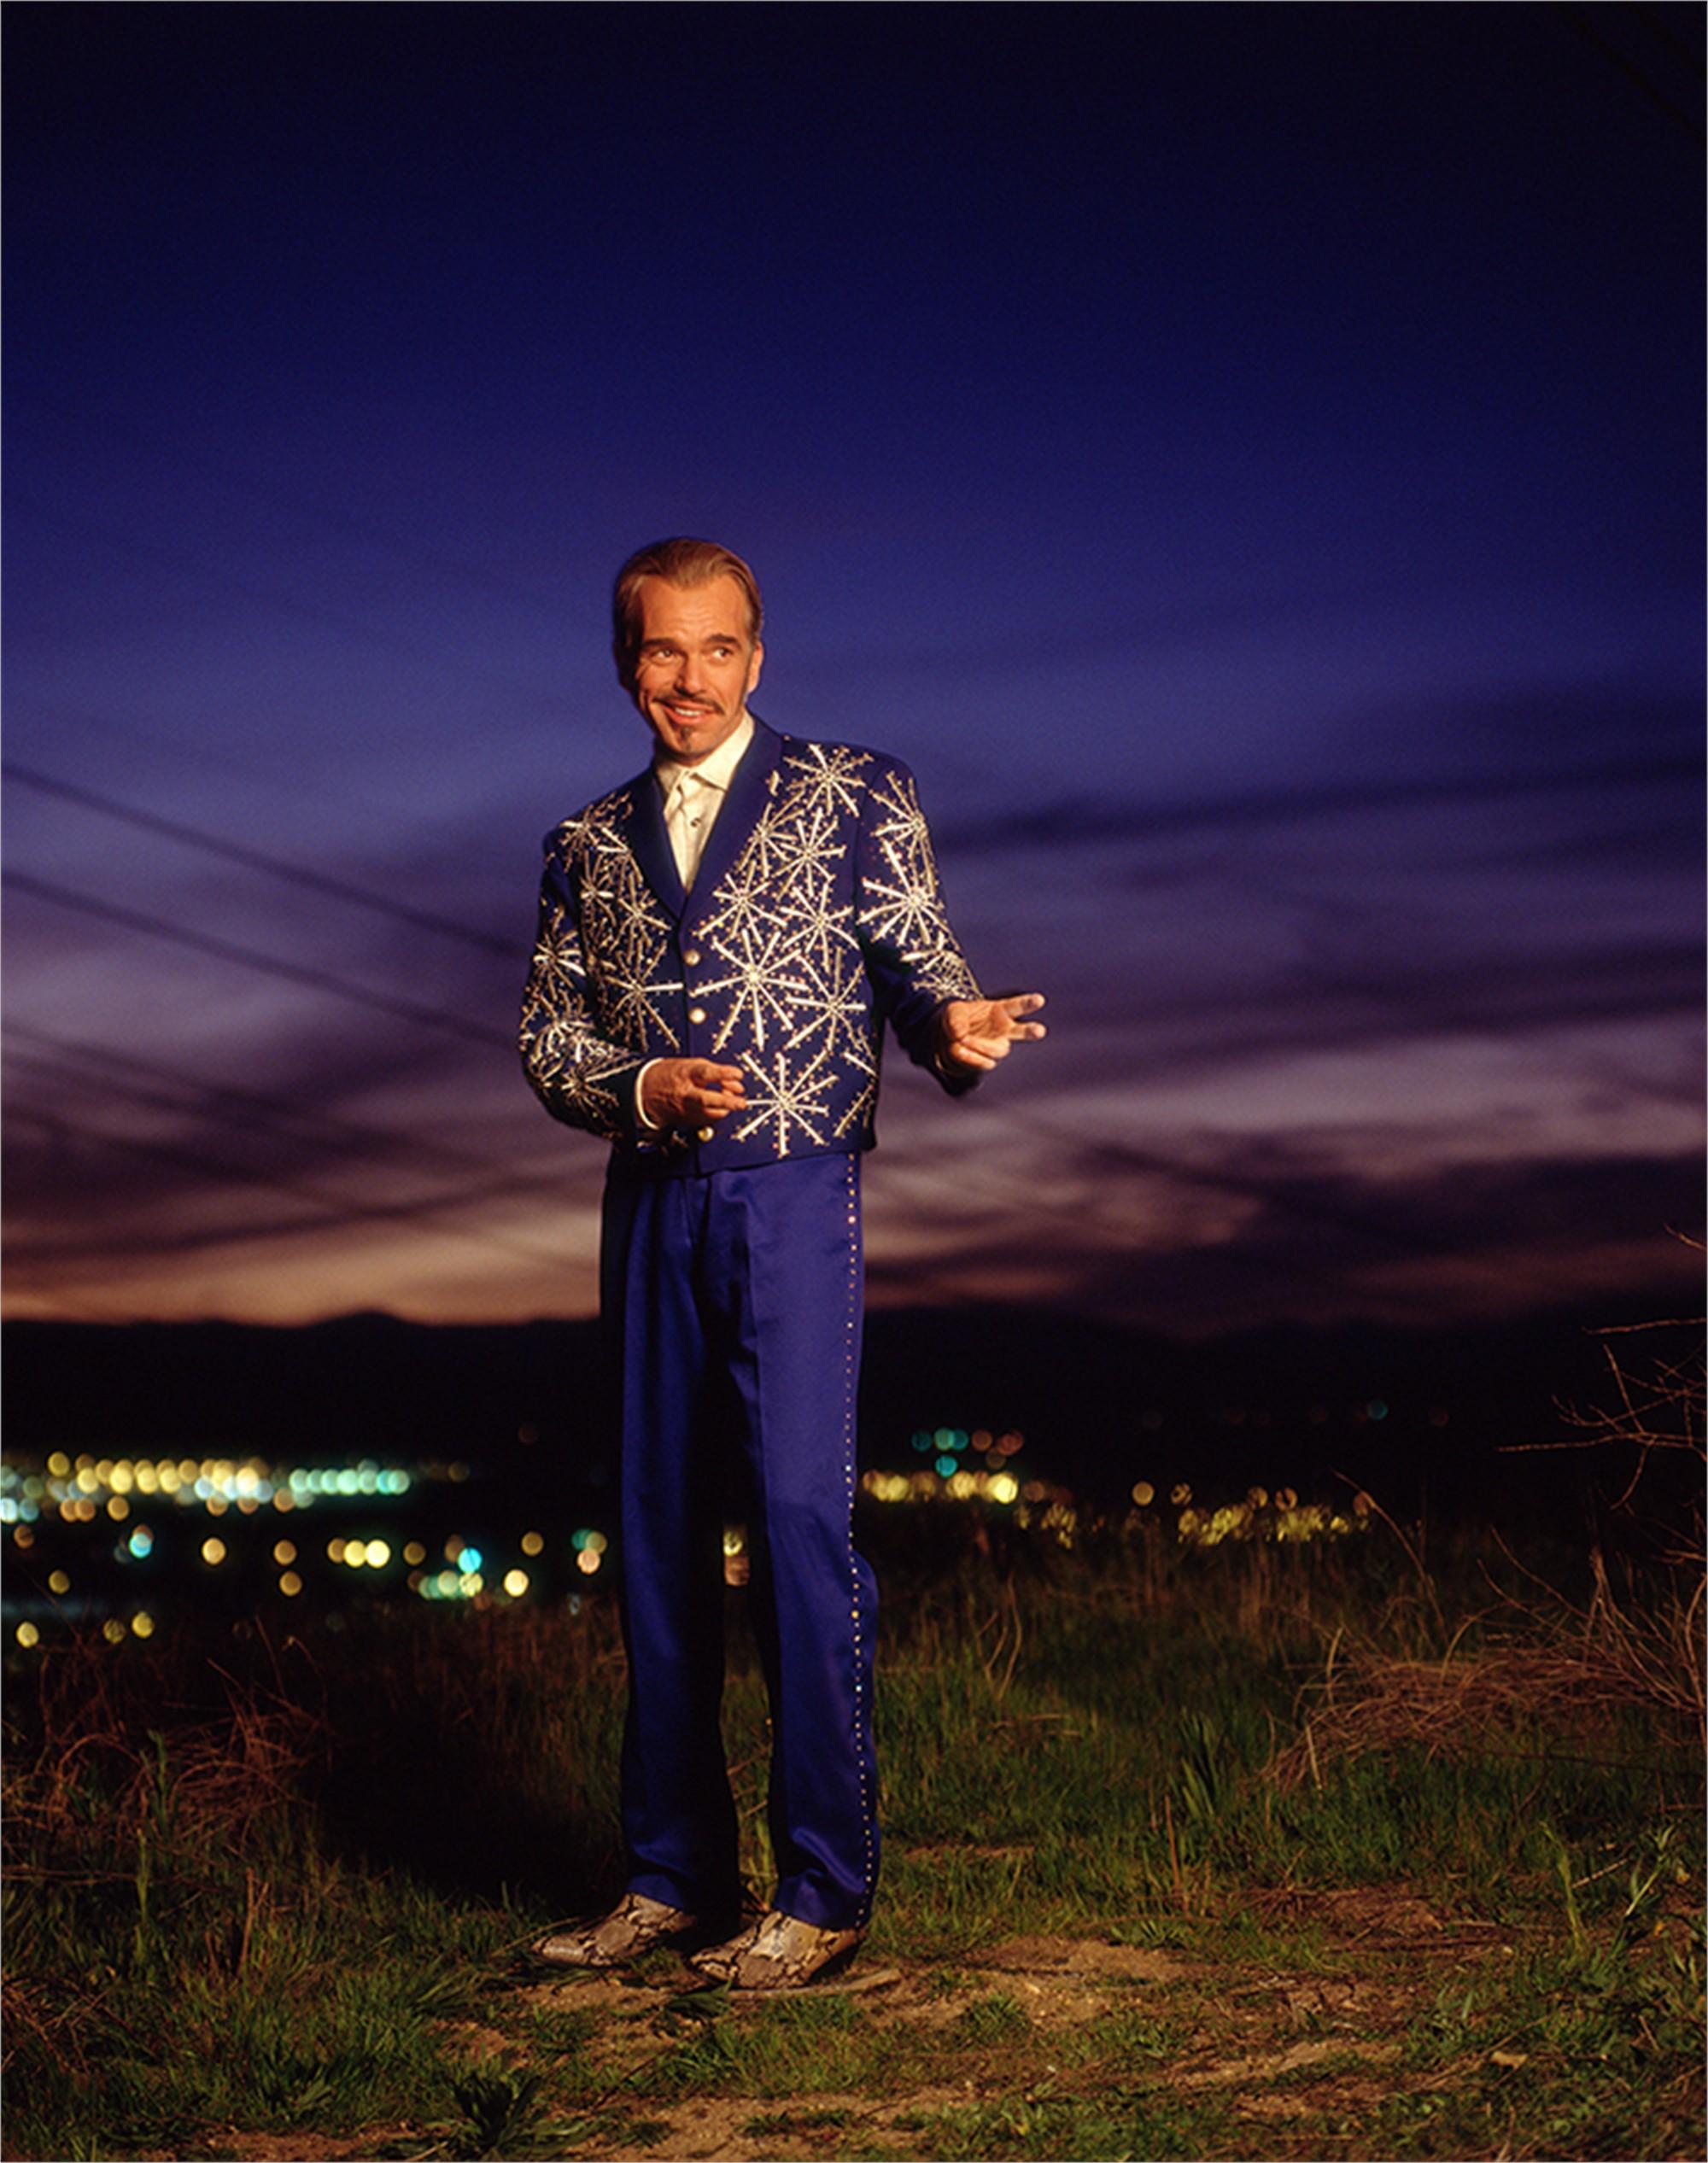 00030 Billy Bob Thornton Purple Sky Color by Timothy White